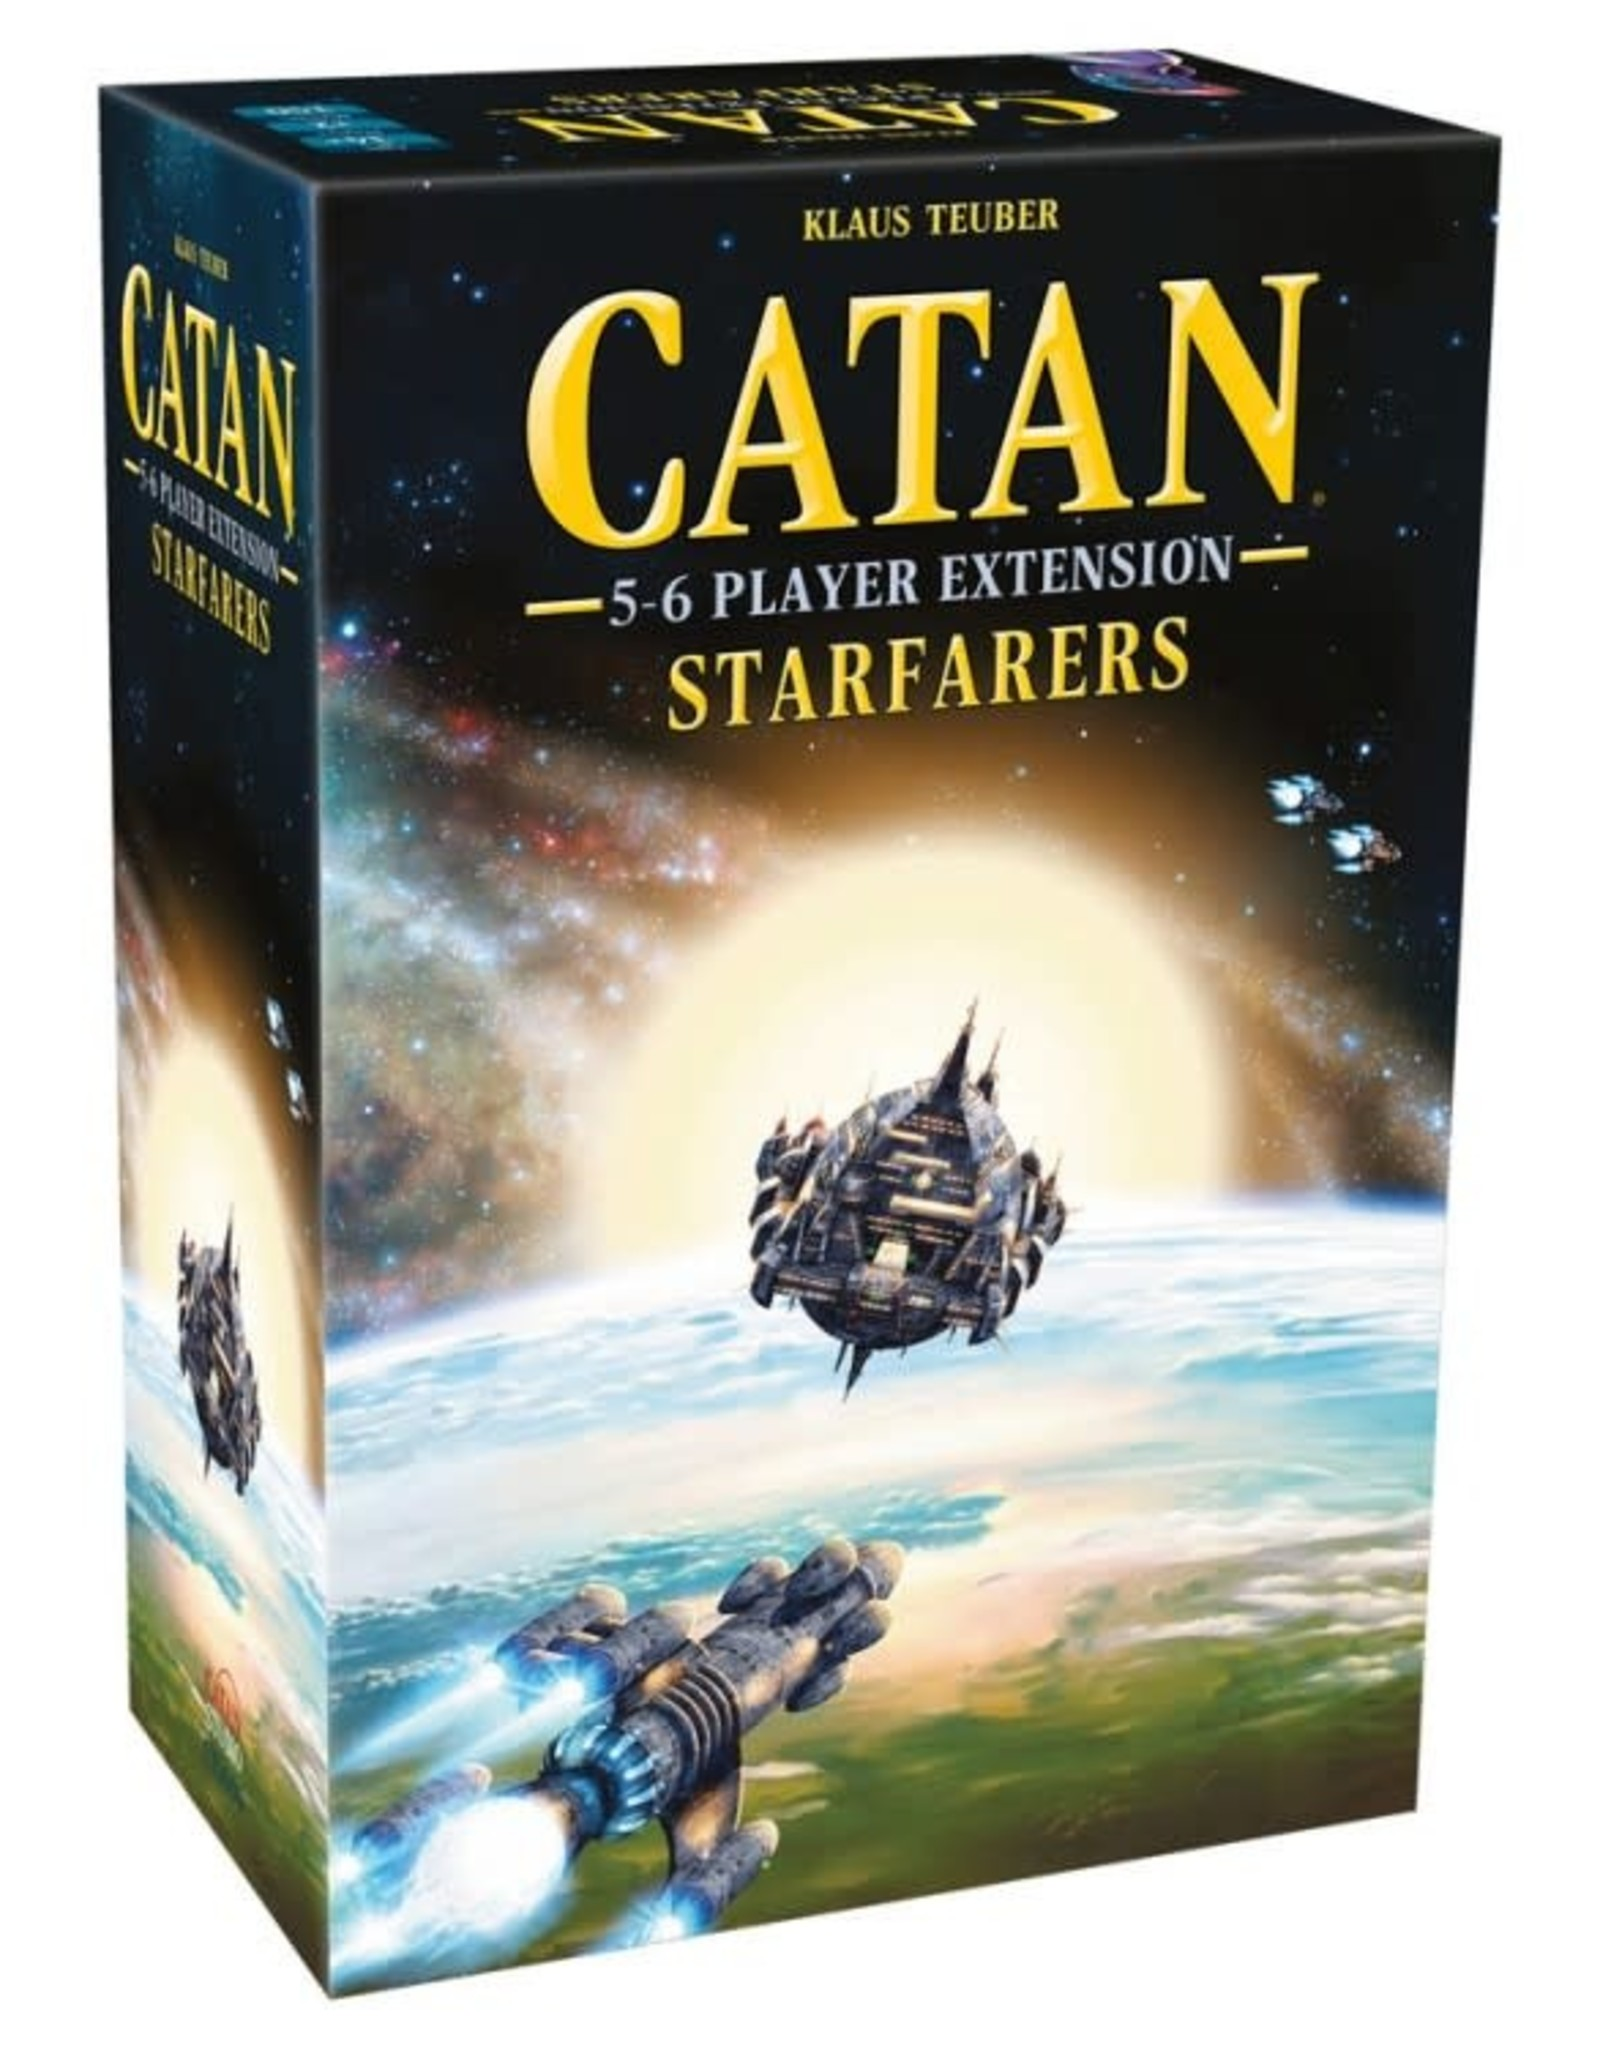 Catan Studio Catan Starfarers 5-6 Players Expansion